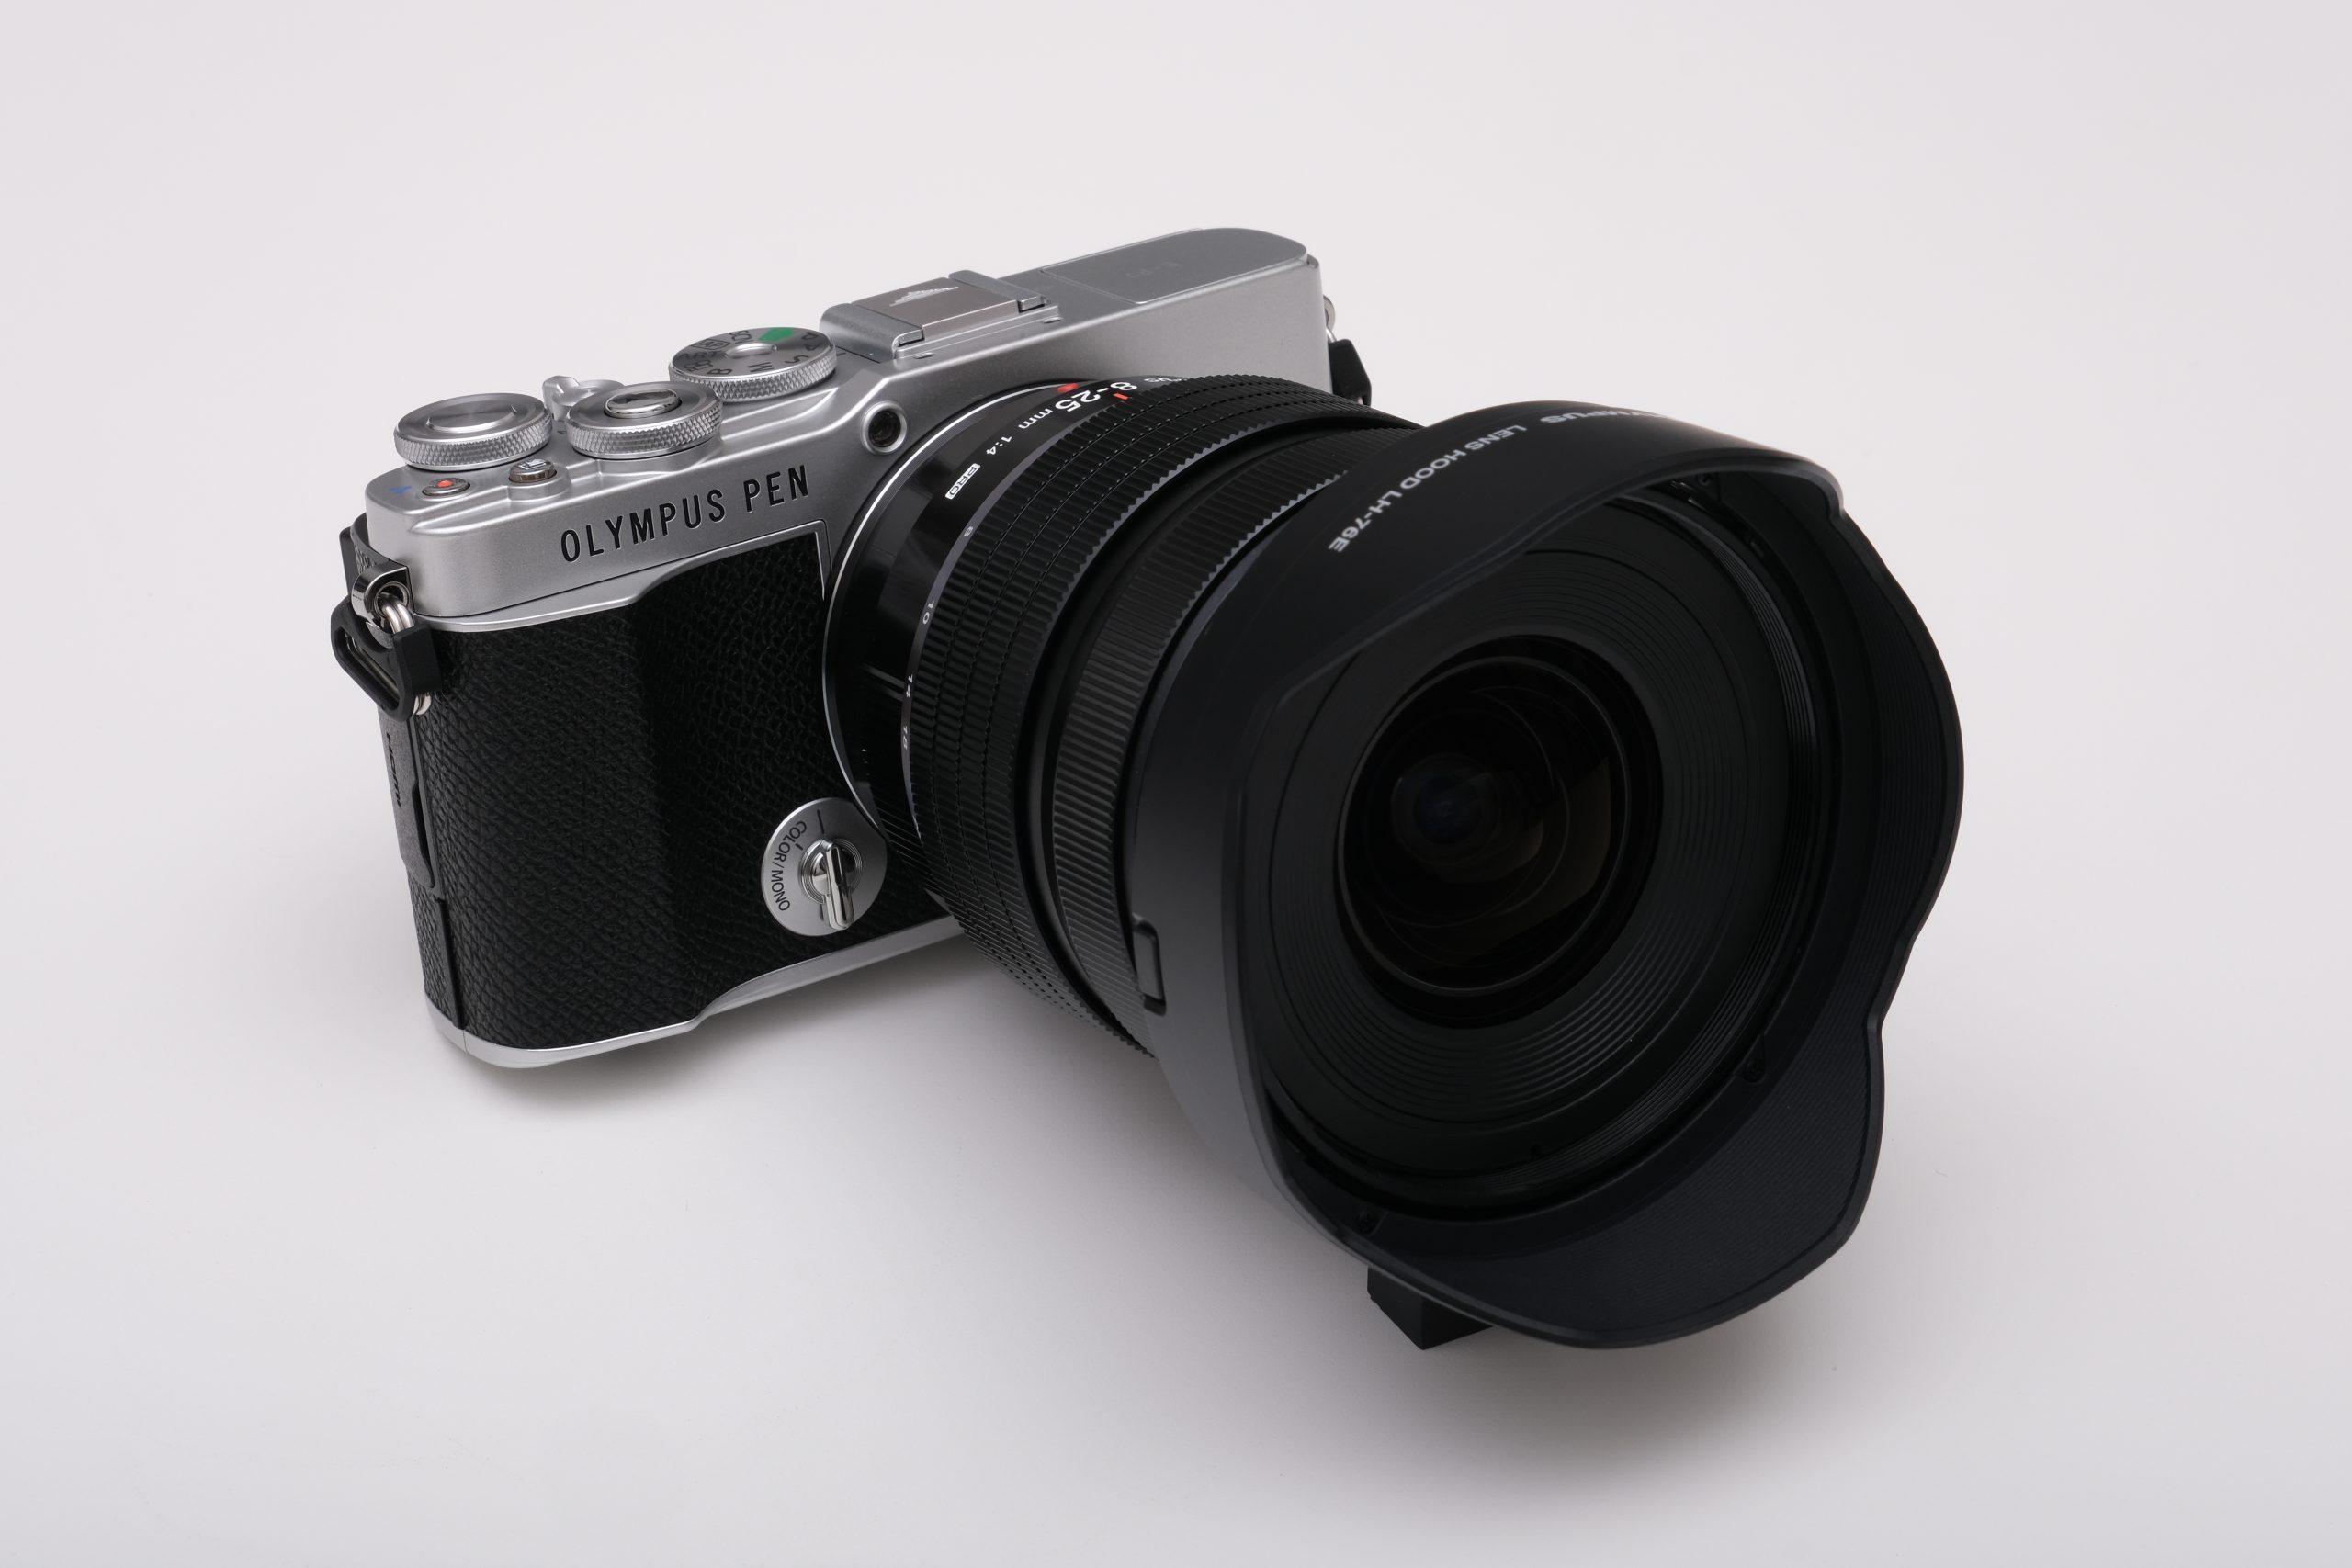 【OLYMPUS】本日発売!E-P7/M.ZUIKO8-25mm F4.0 PRO